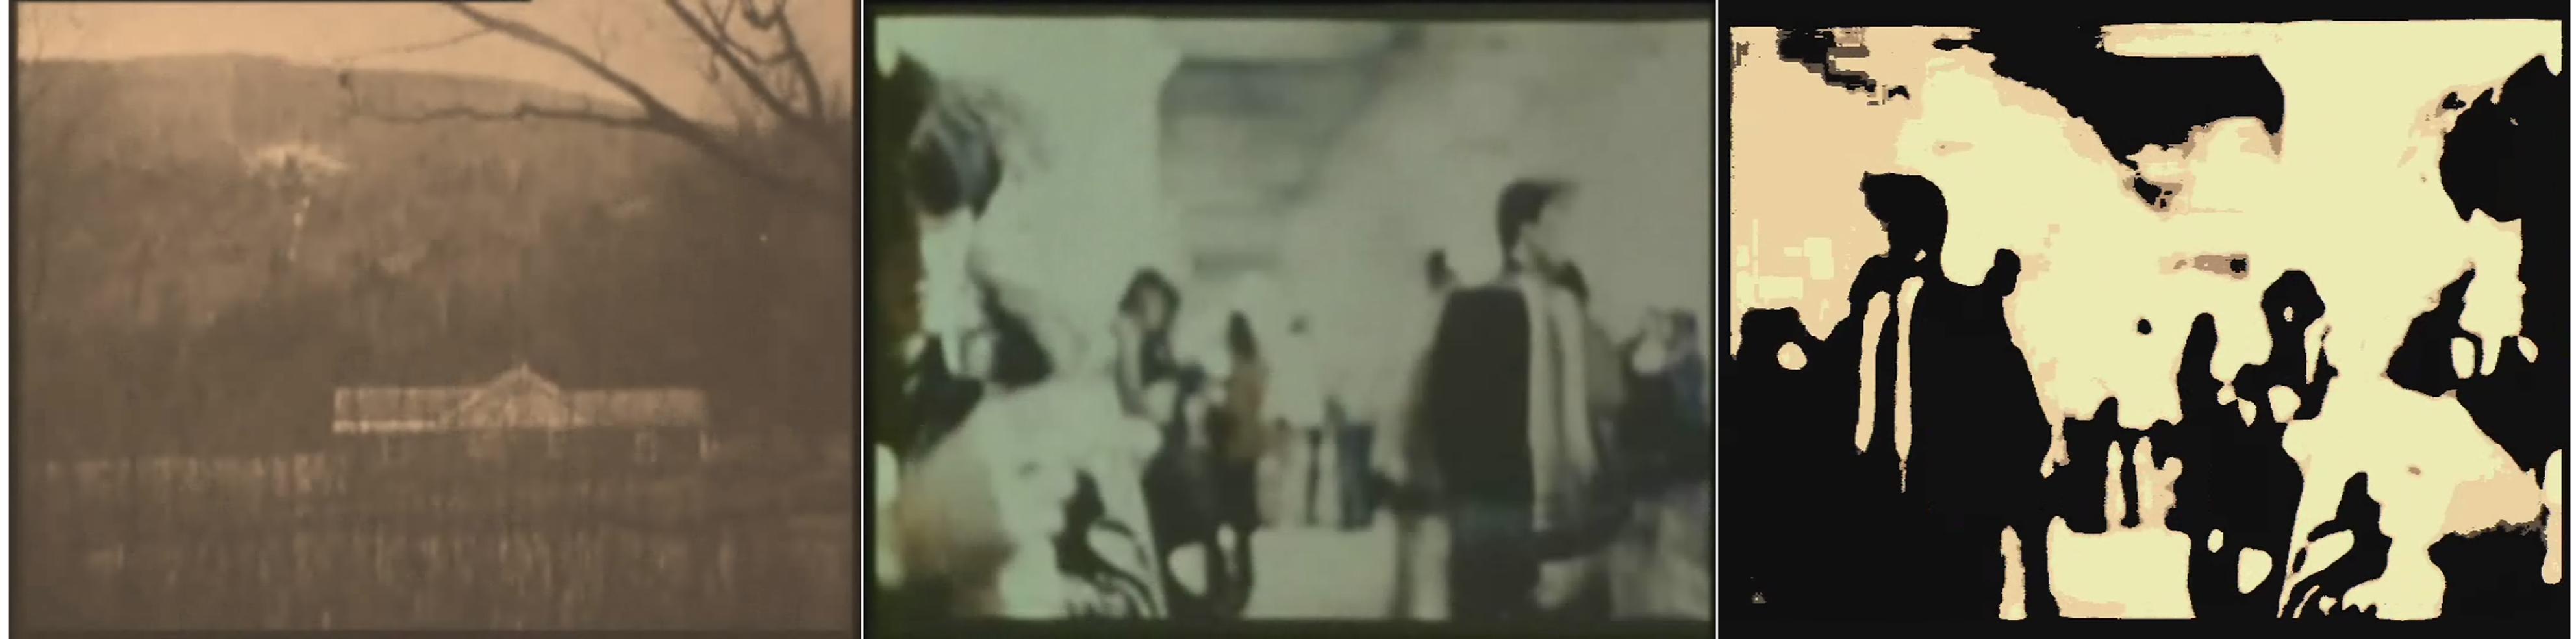 Va de pantallas: Jaime Rodríguez 'HYPSIS'